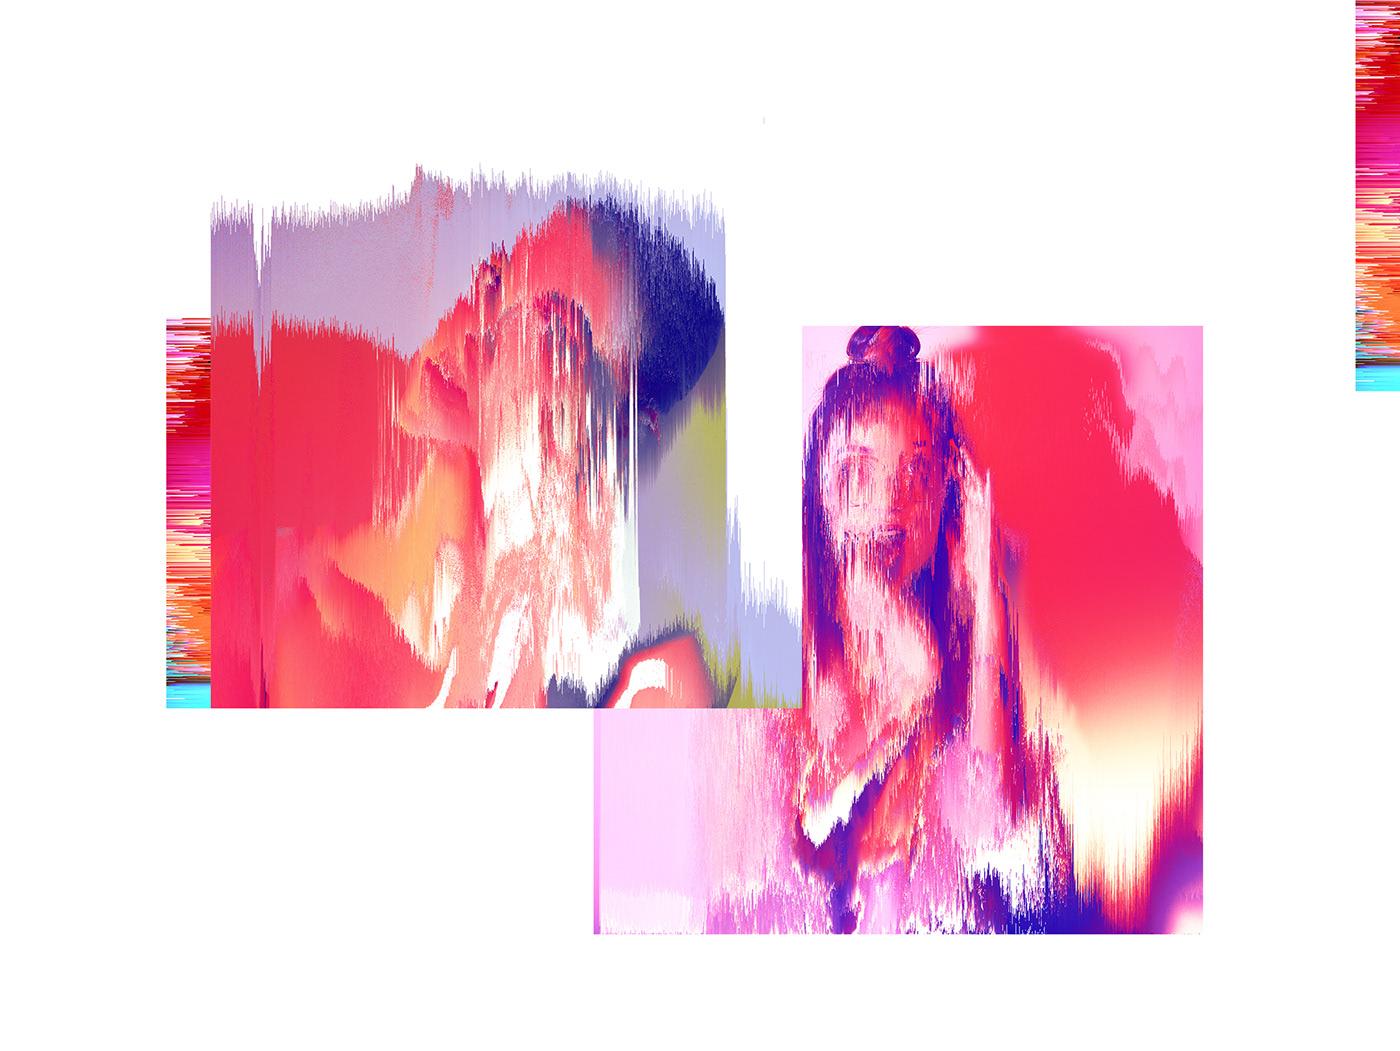 girls fire Glitch pink woman pixel sorting